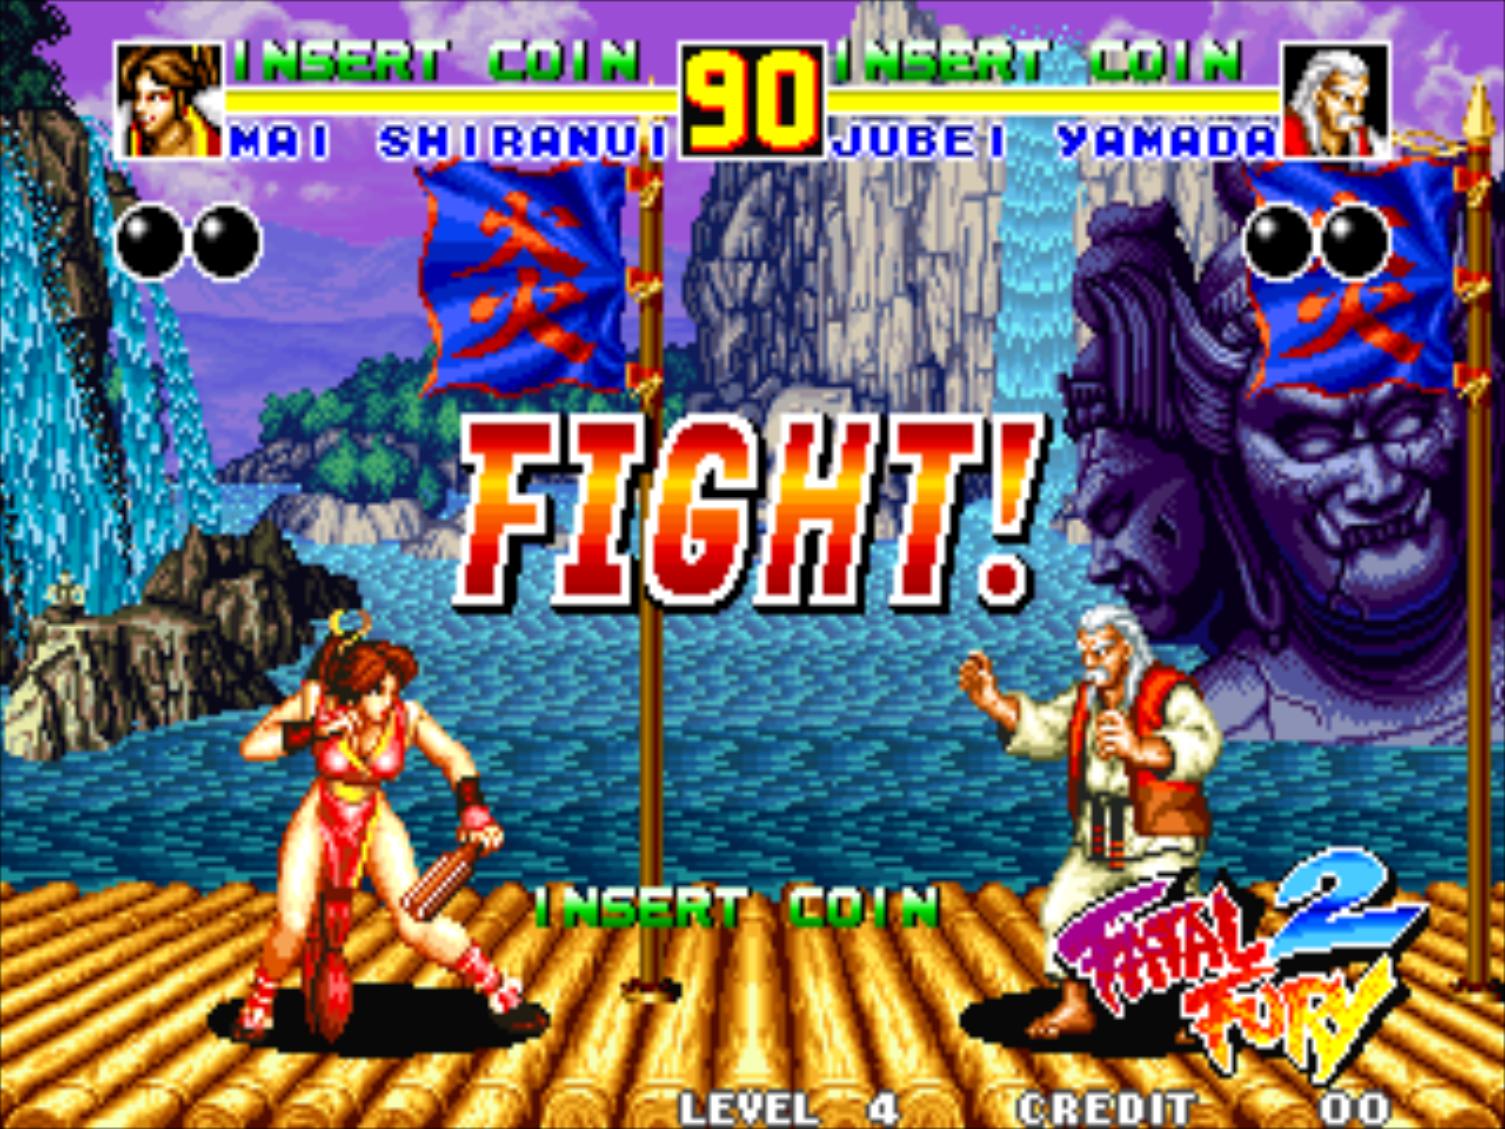 Fatal Fury 2 Lutris